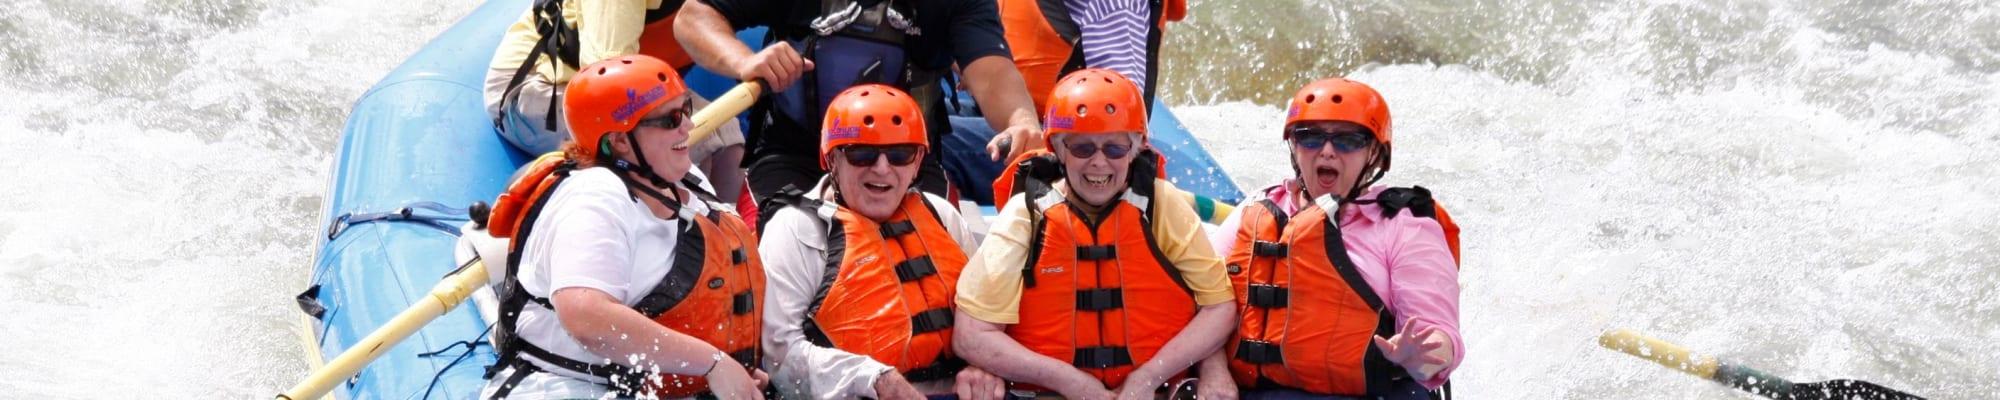 Blog at Cypress Springs Gracious Retirement Living in Bradenton, Florida